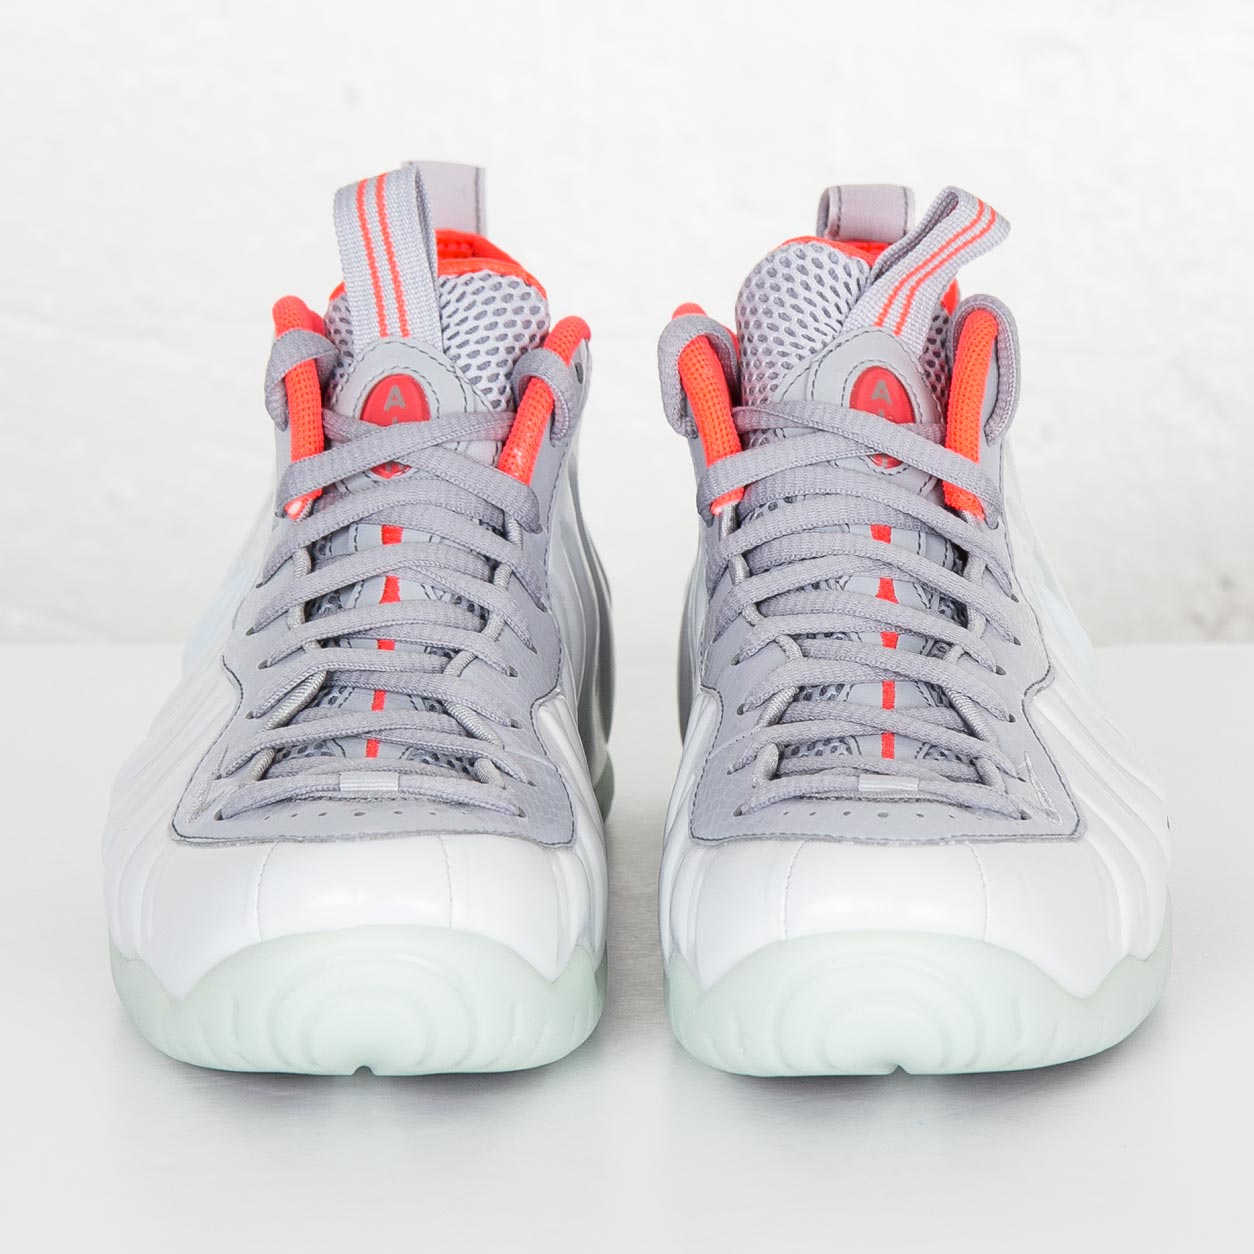 4cfe073189d Nike Air Foamposite Pro Premium - 616750-003 - Sneakersnstuff ...